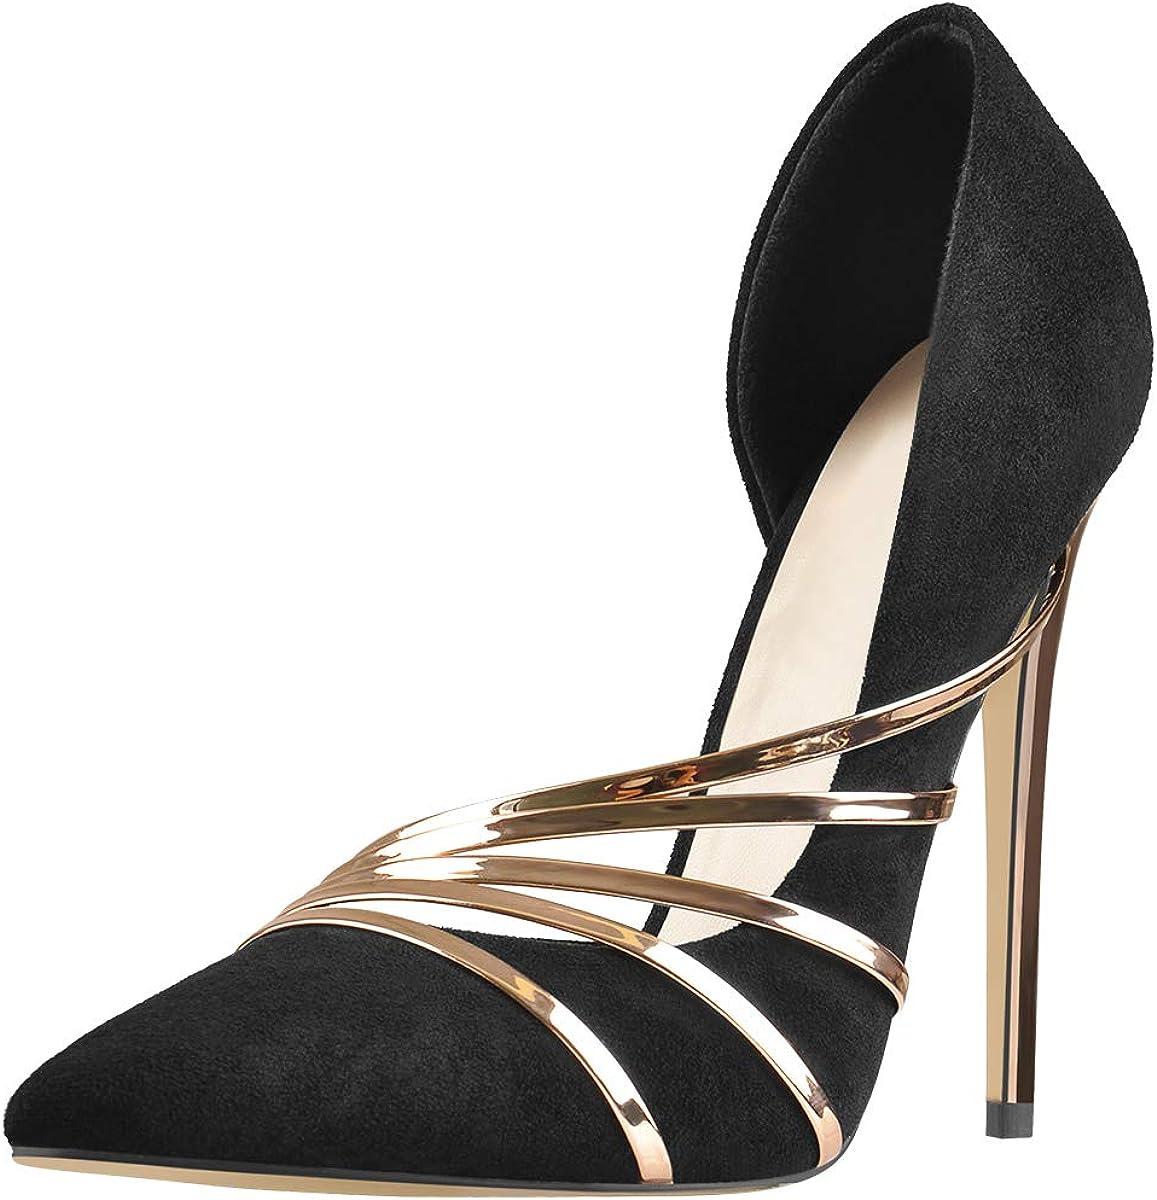 Ranking TOP11 Richealnana Women's Pointed Toe Pumps Long Beach Mall Heel Shoes Stiletto